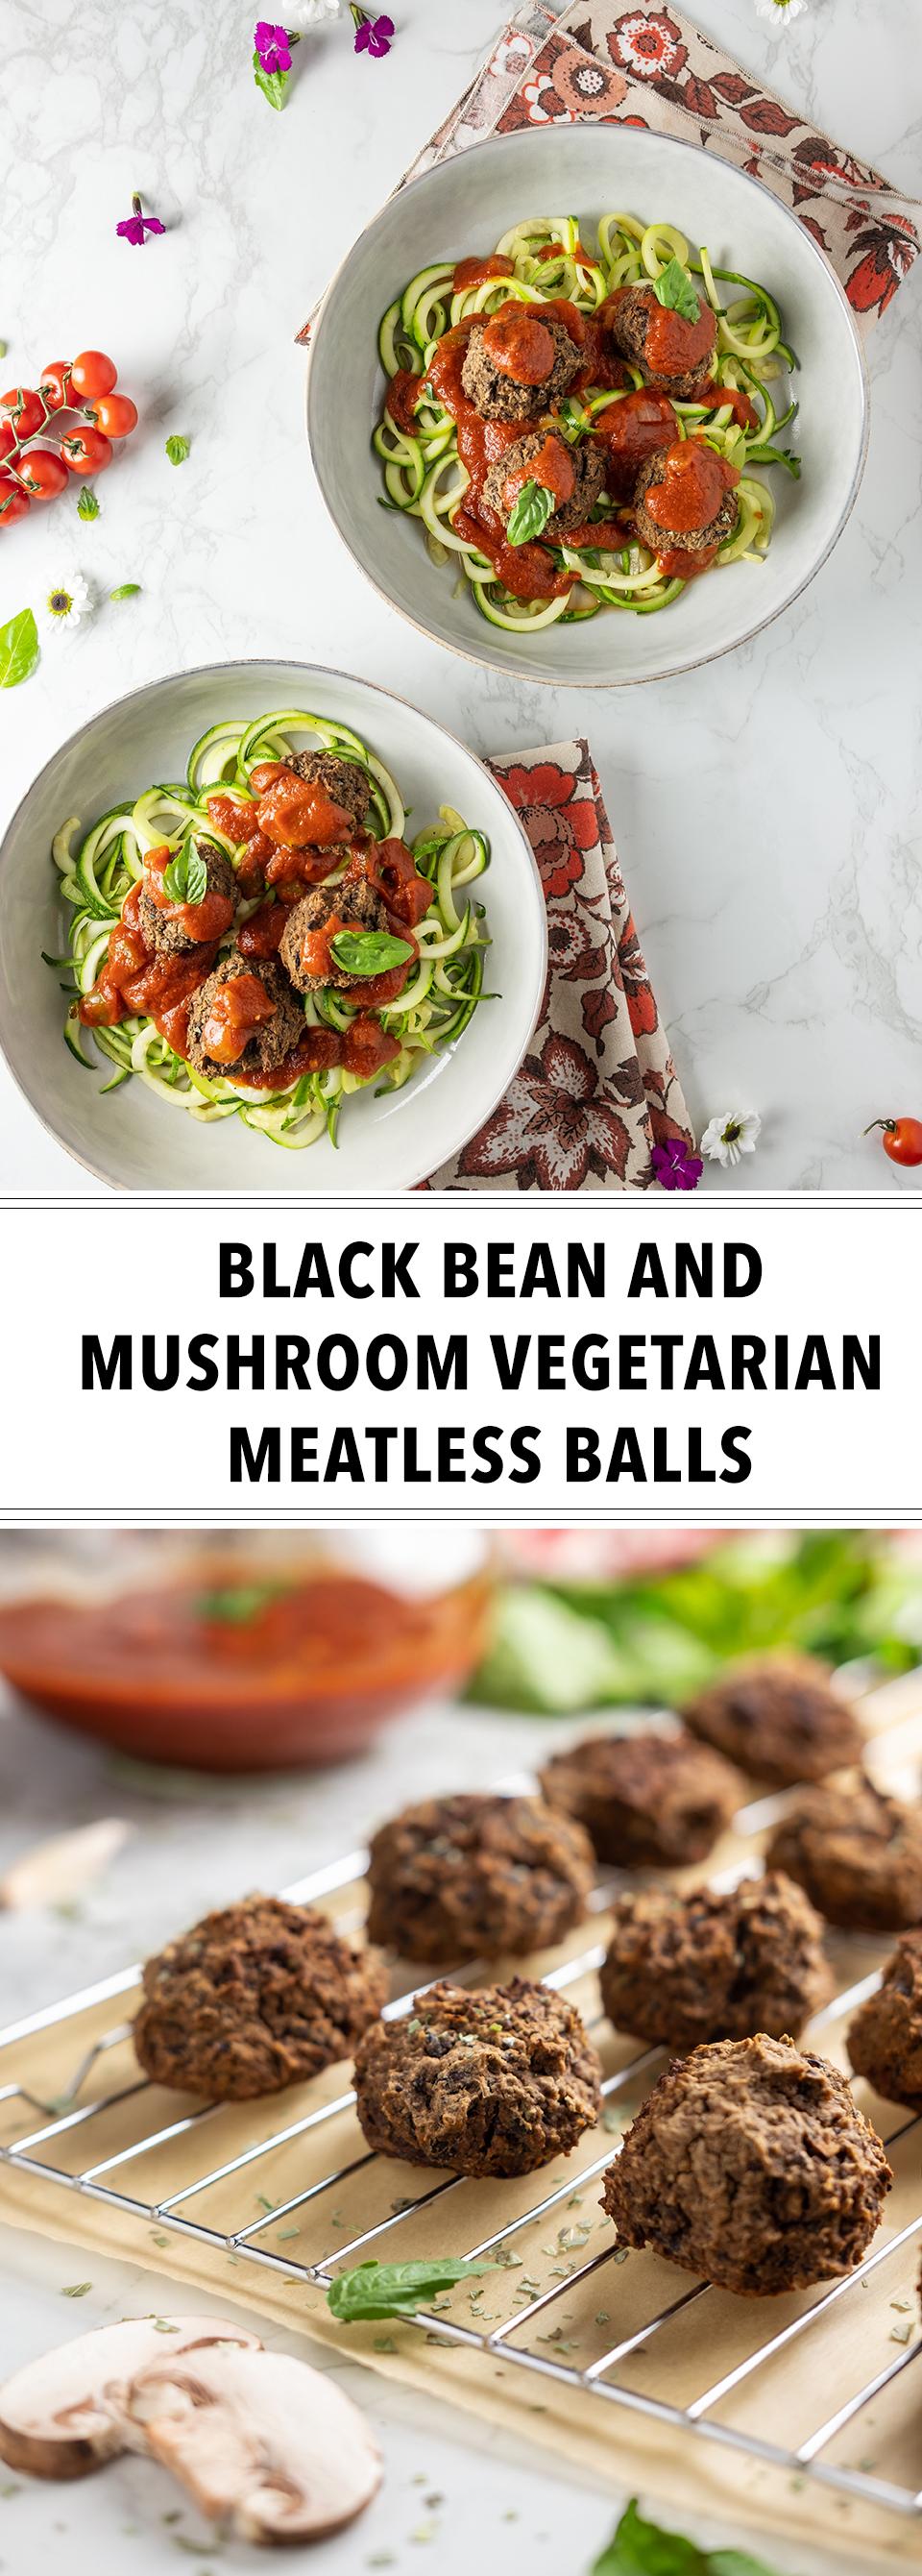 JodiLoves_Retouching_Brilliant_Pixel_Imaging_Black-Bean-mushroom-vegetarian-meatless-balls.jpg